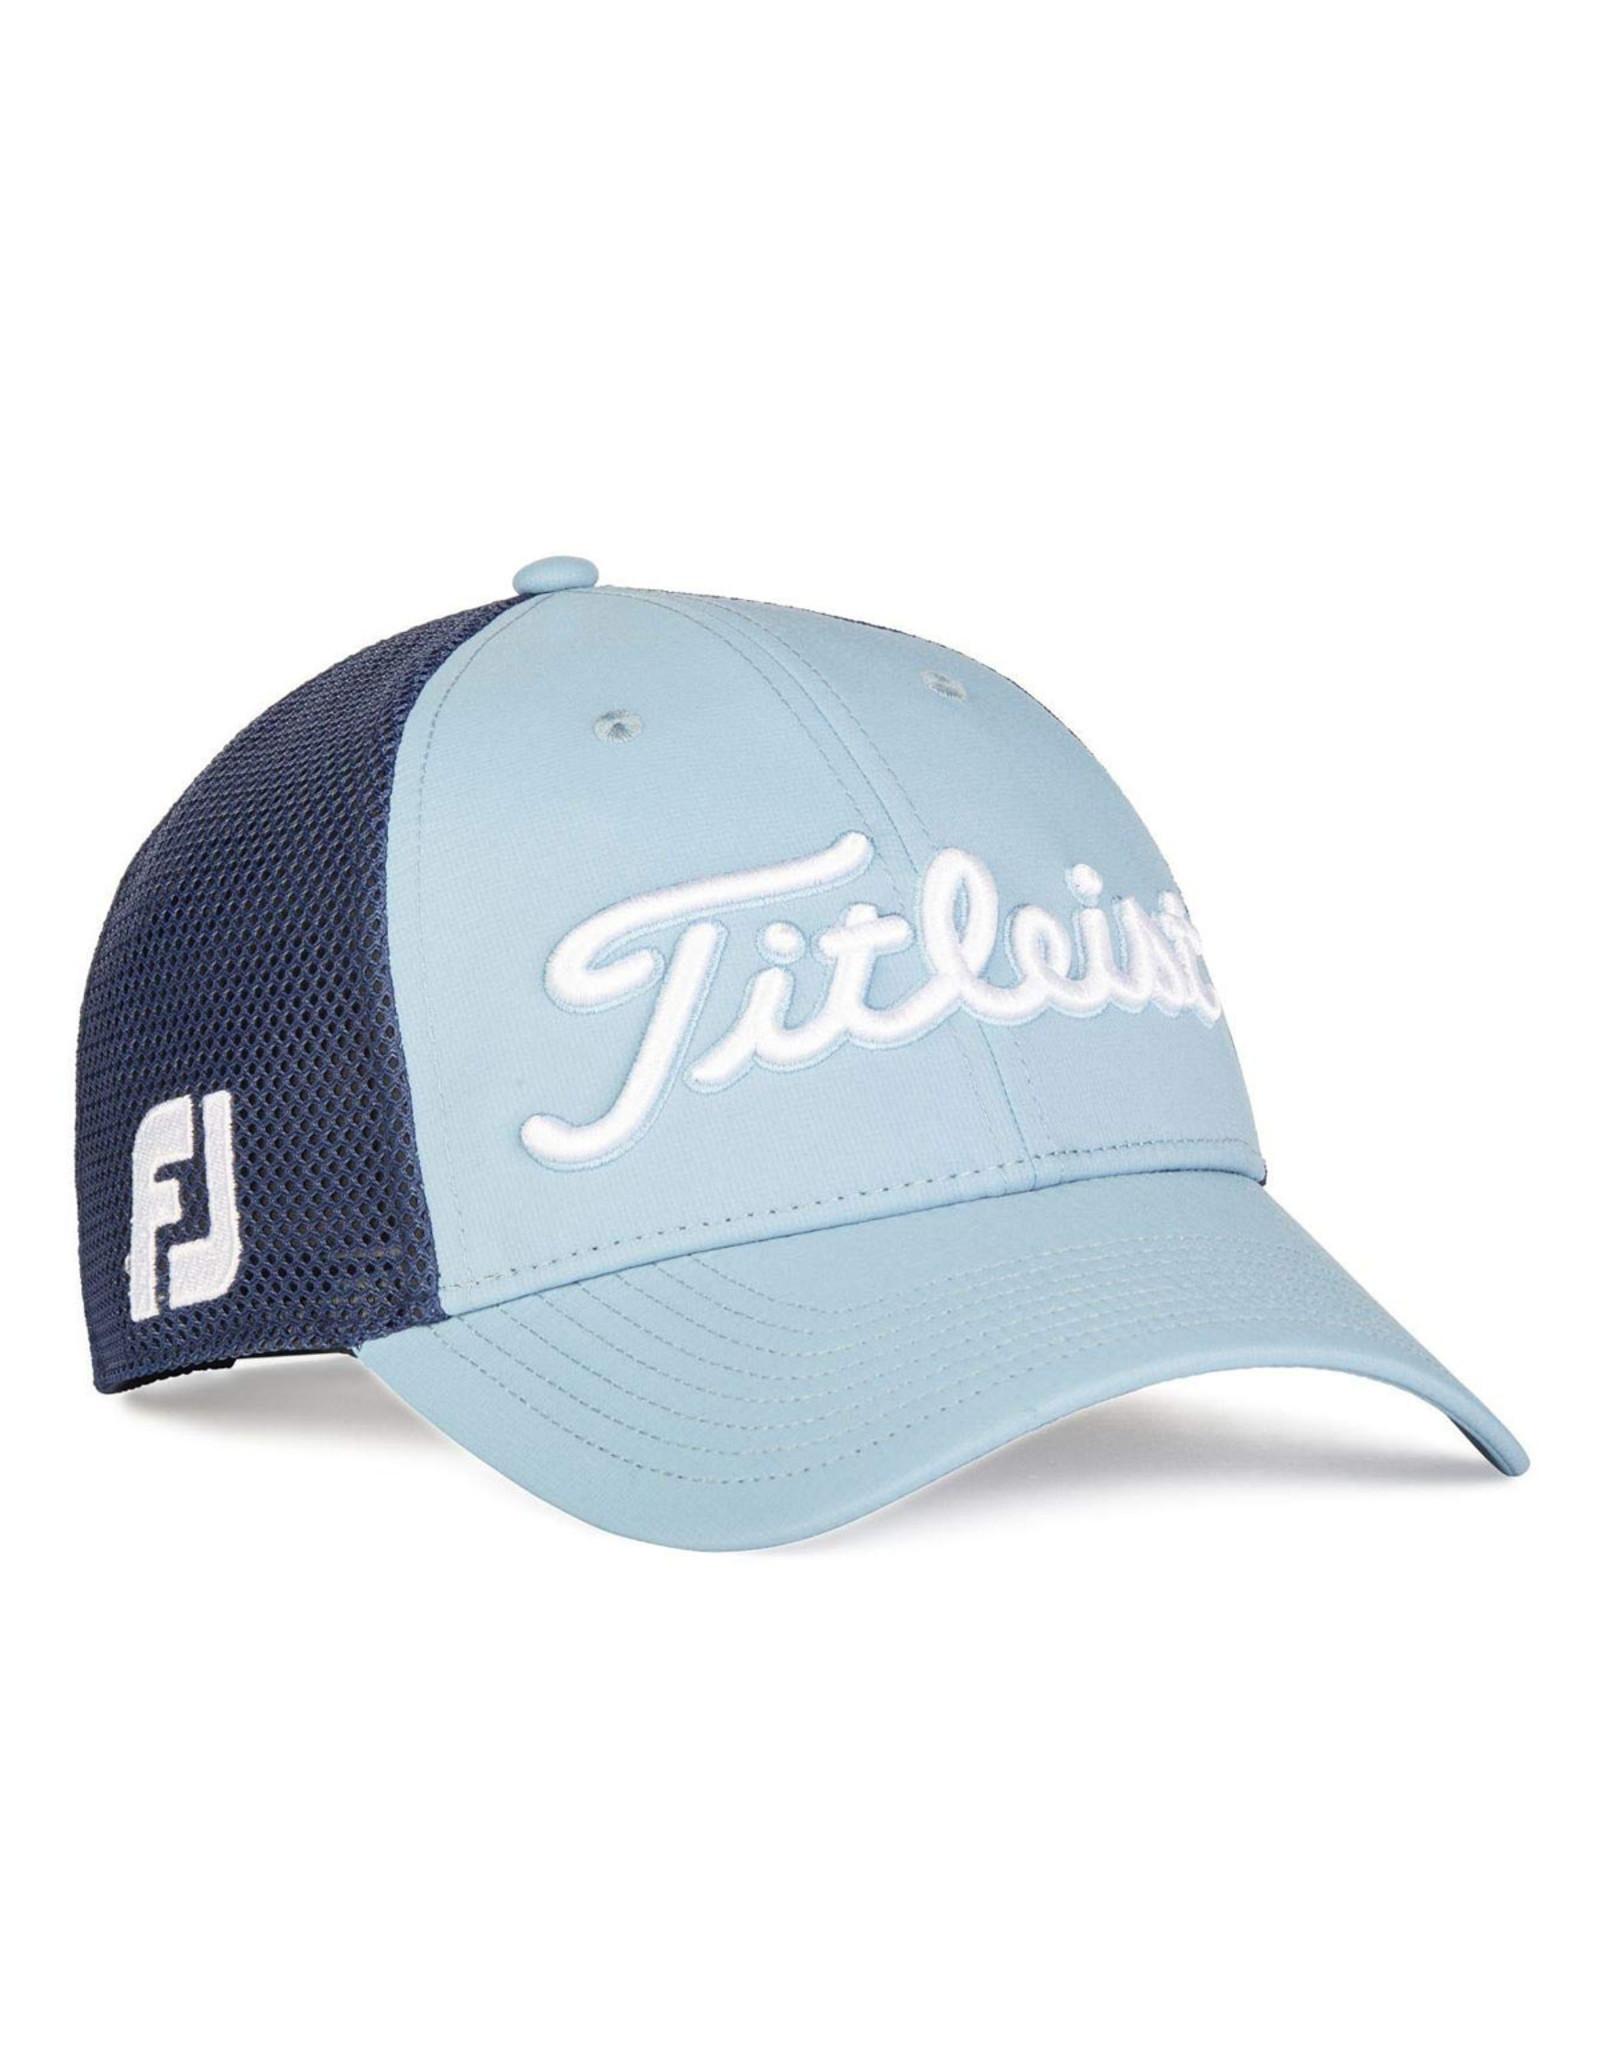 Titleist Titleist Tour Perf Mesh Men's Hat